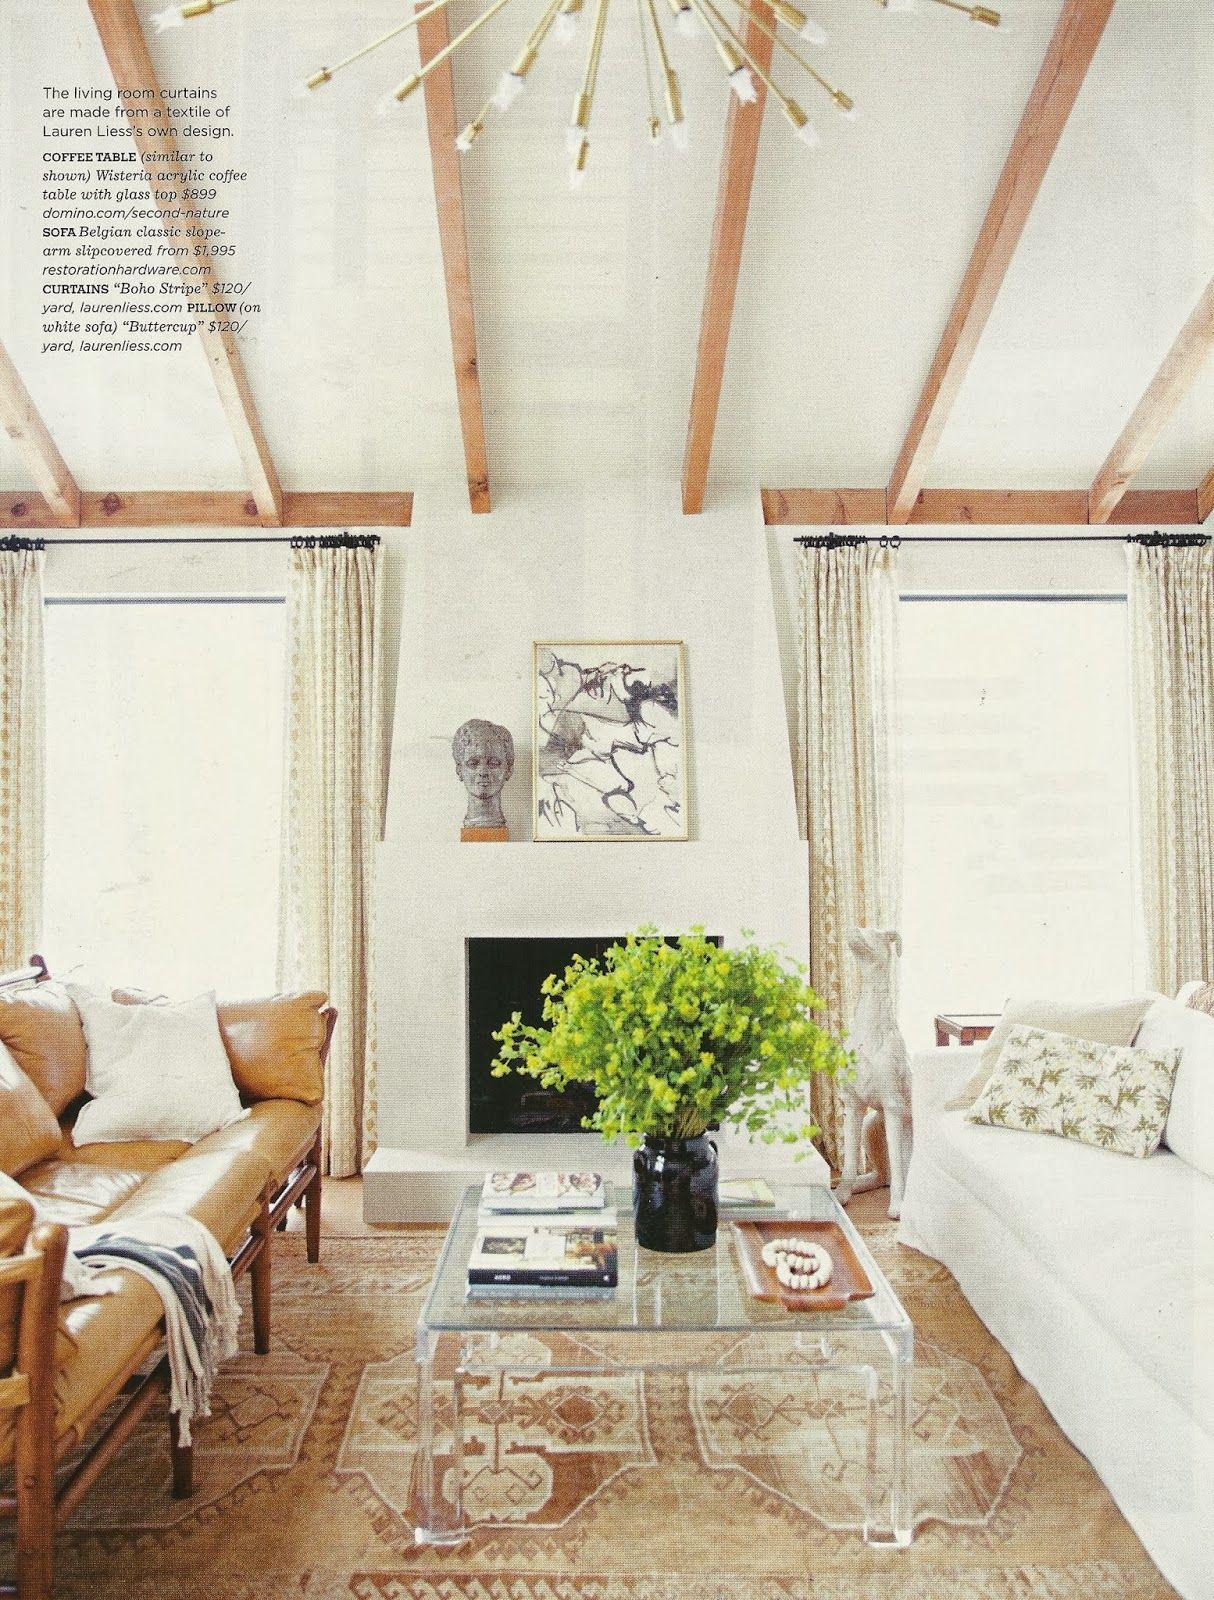 My notting hill blog - My Notting Hill Lauren Liess House In Domino